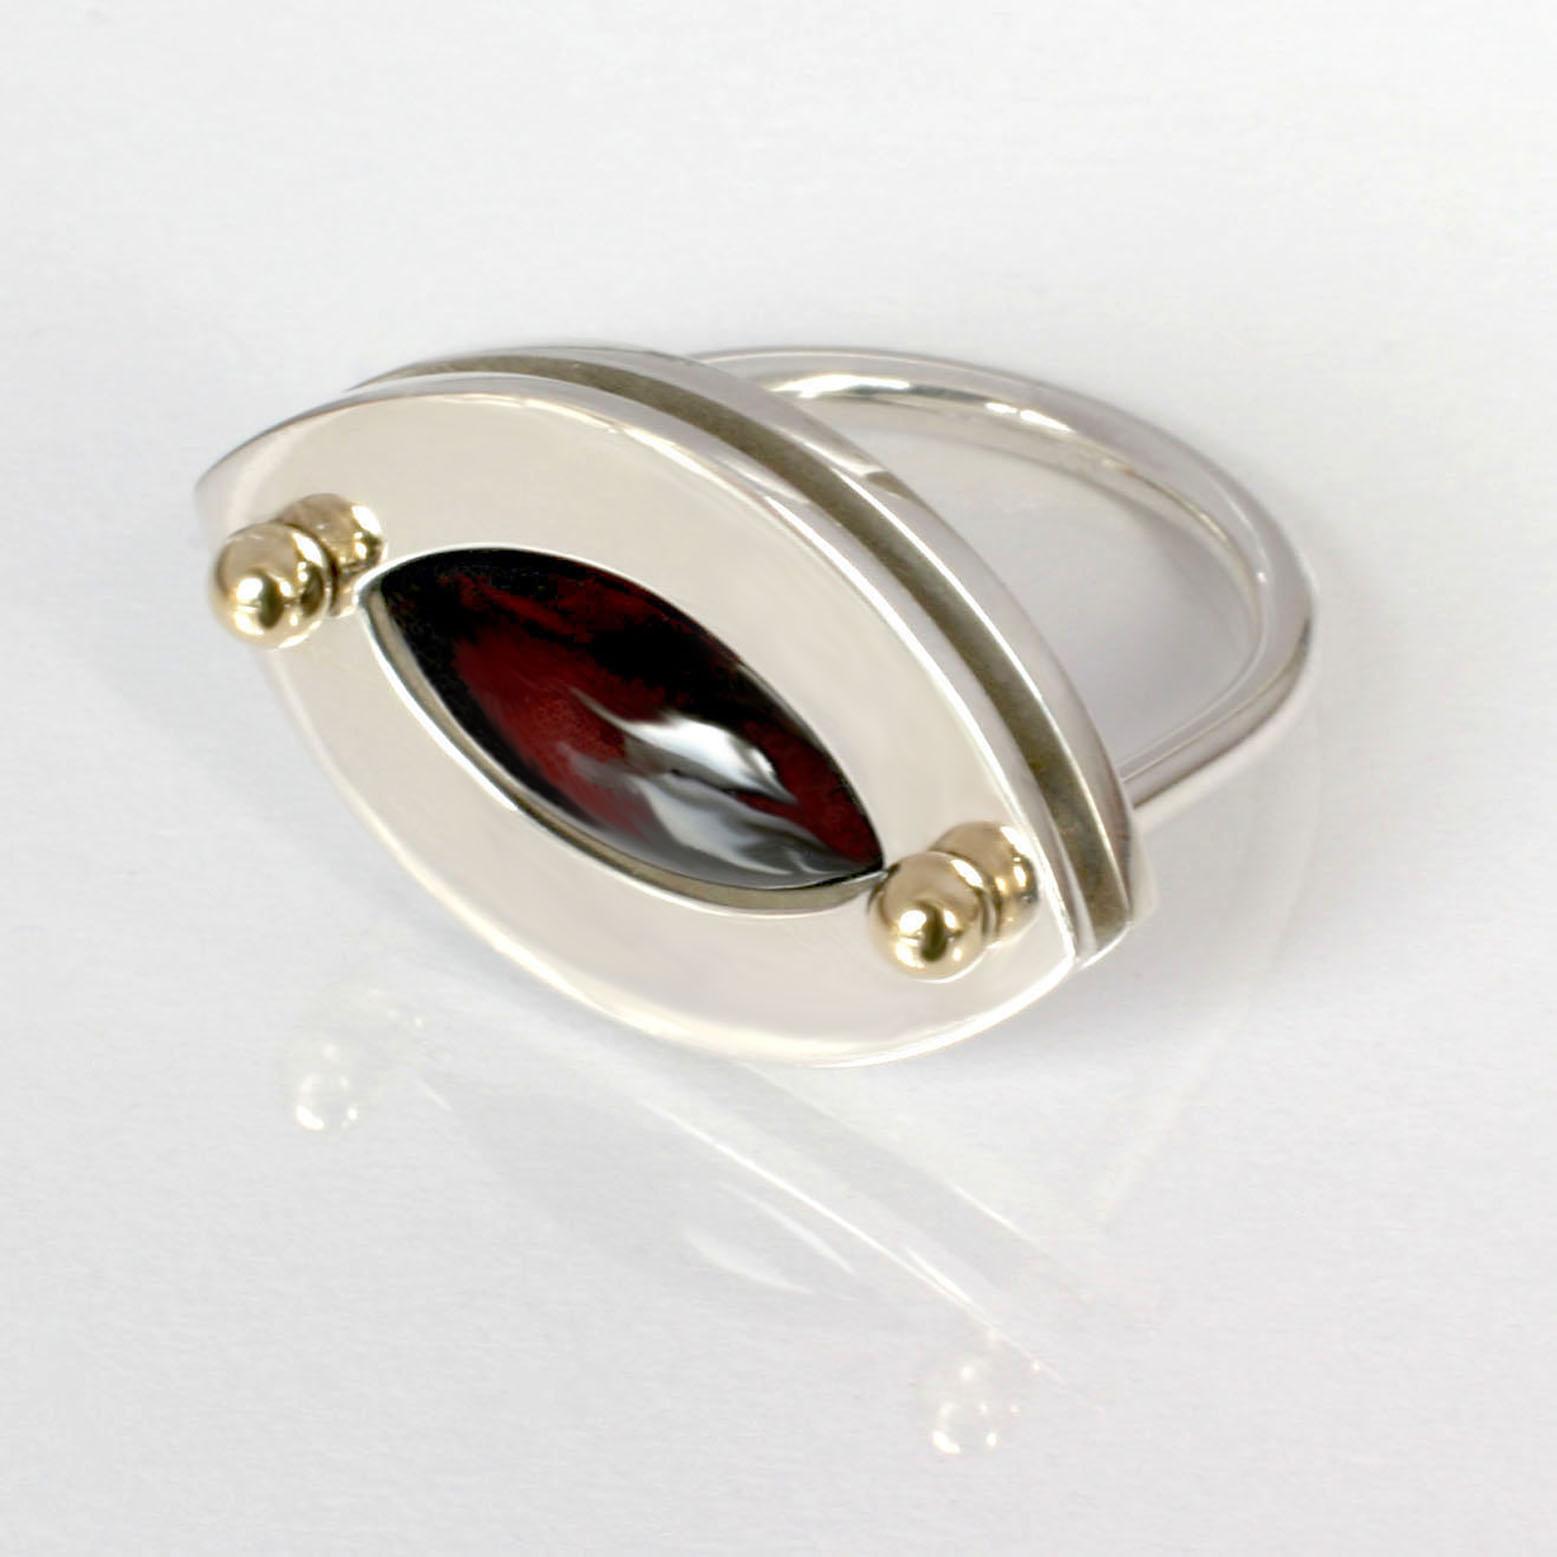 12 ring silver 18 ct gold details garnet.jpg